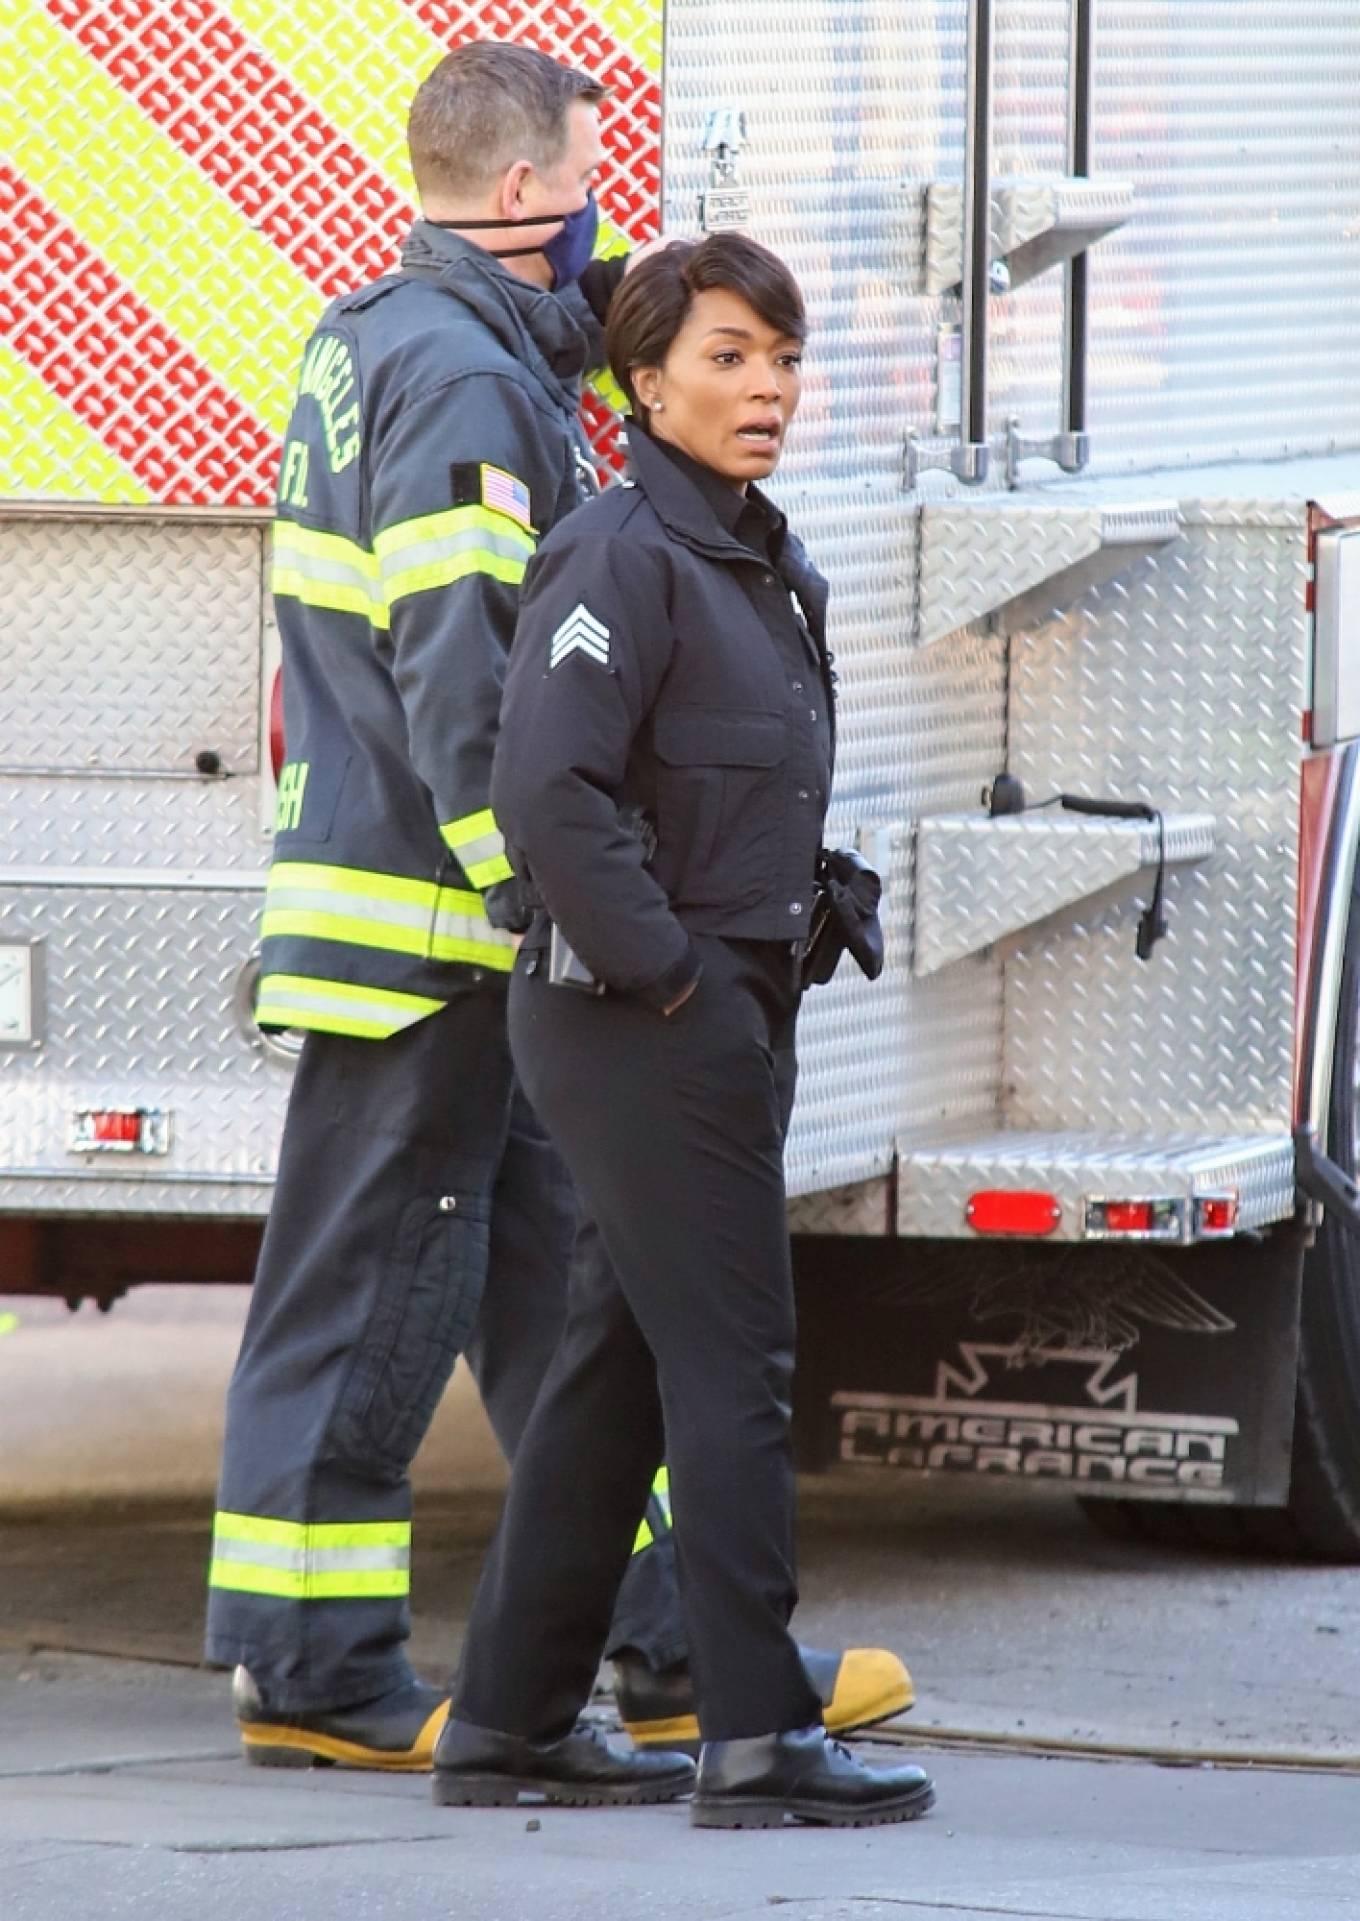 Angela Bassett - On set Rescue 9-1-1 in Los Angeles